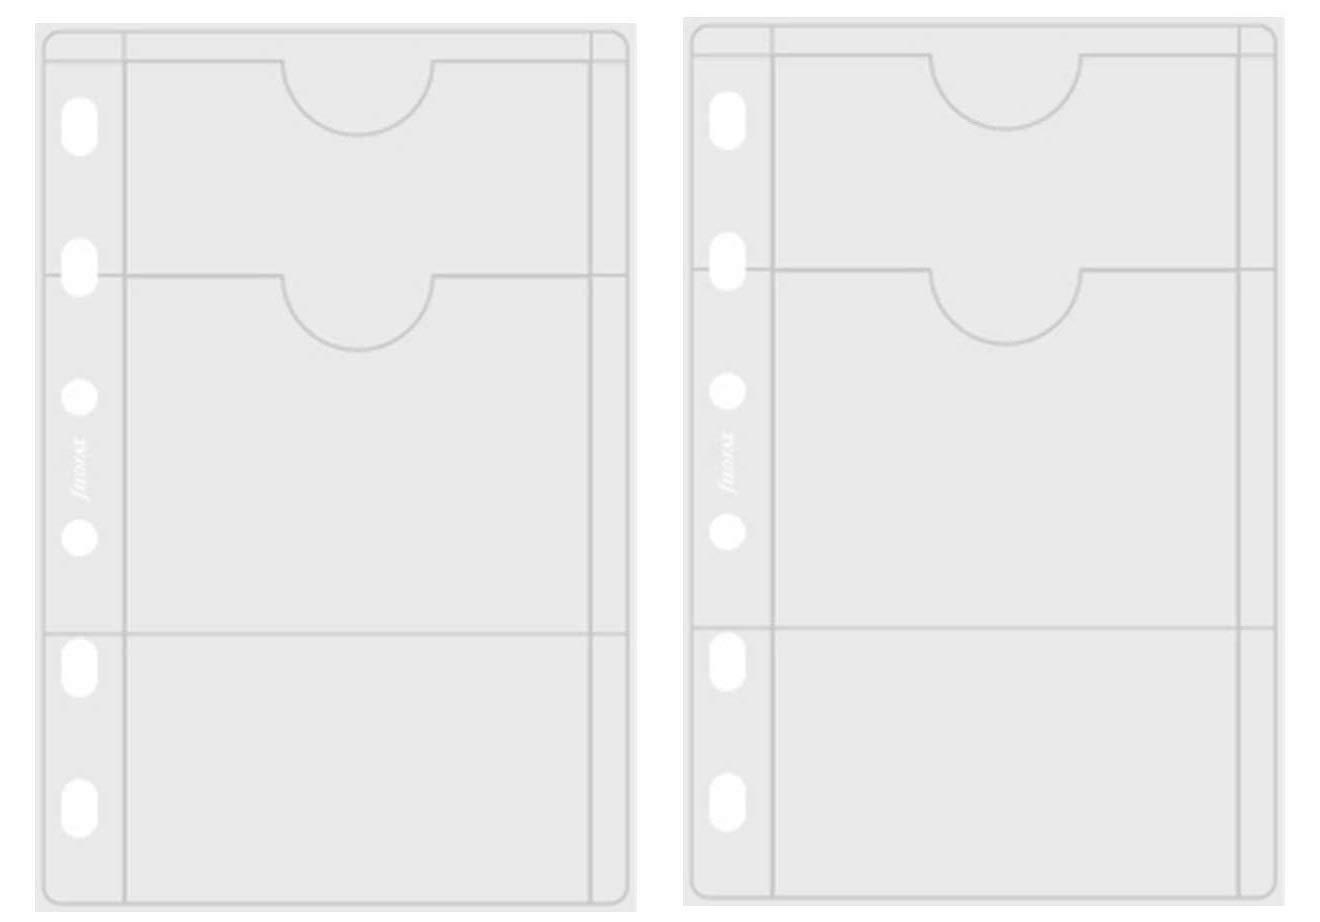 Amazon.com: Filofax Pocket – Recambio para agenda titular de ...